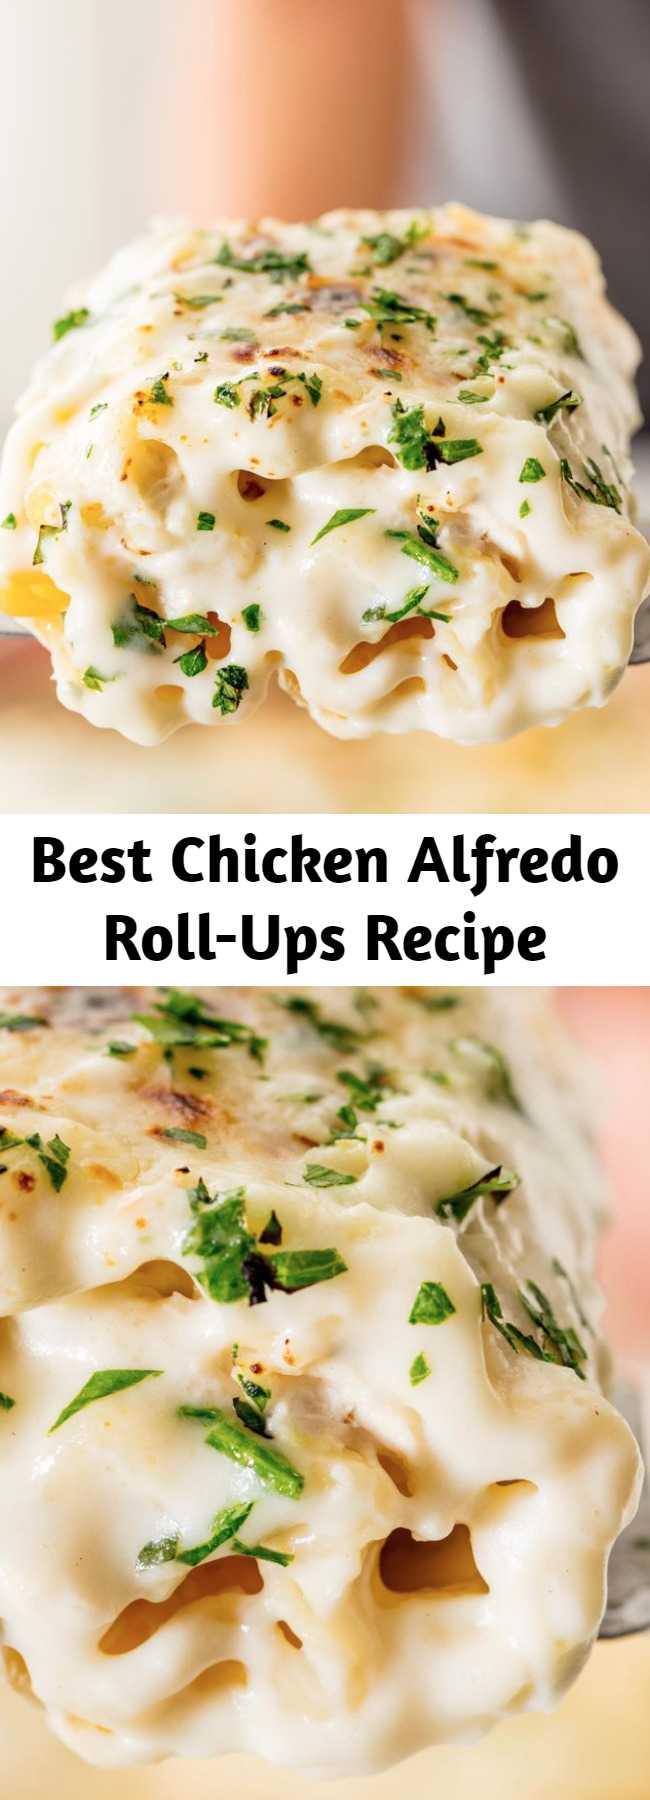 Best Chicken Alfredo Roll-Ups Recipe - Chicken alfredo roll-ups are a dreamy, creamy weeknight dinner masterpiece.